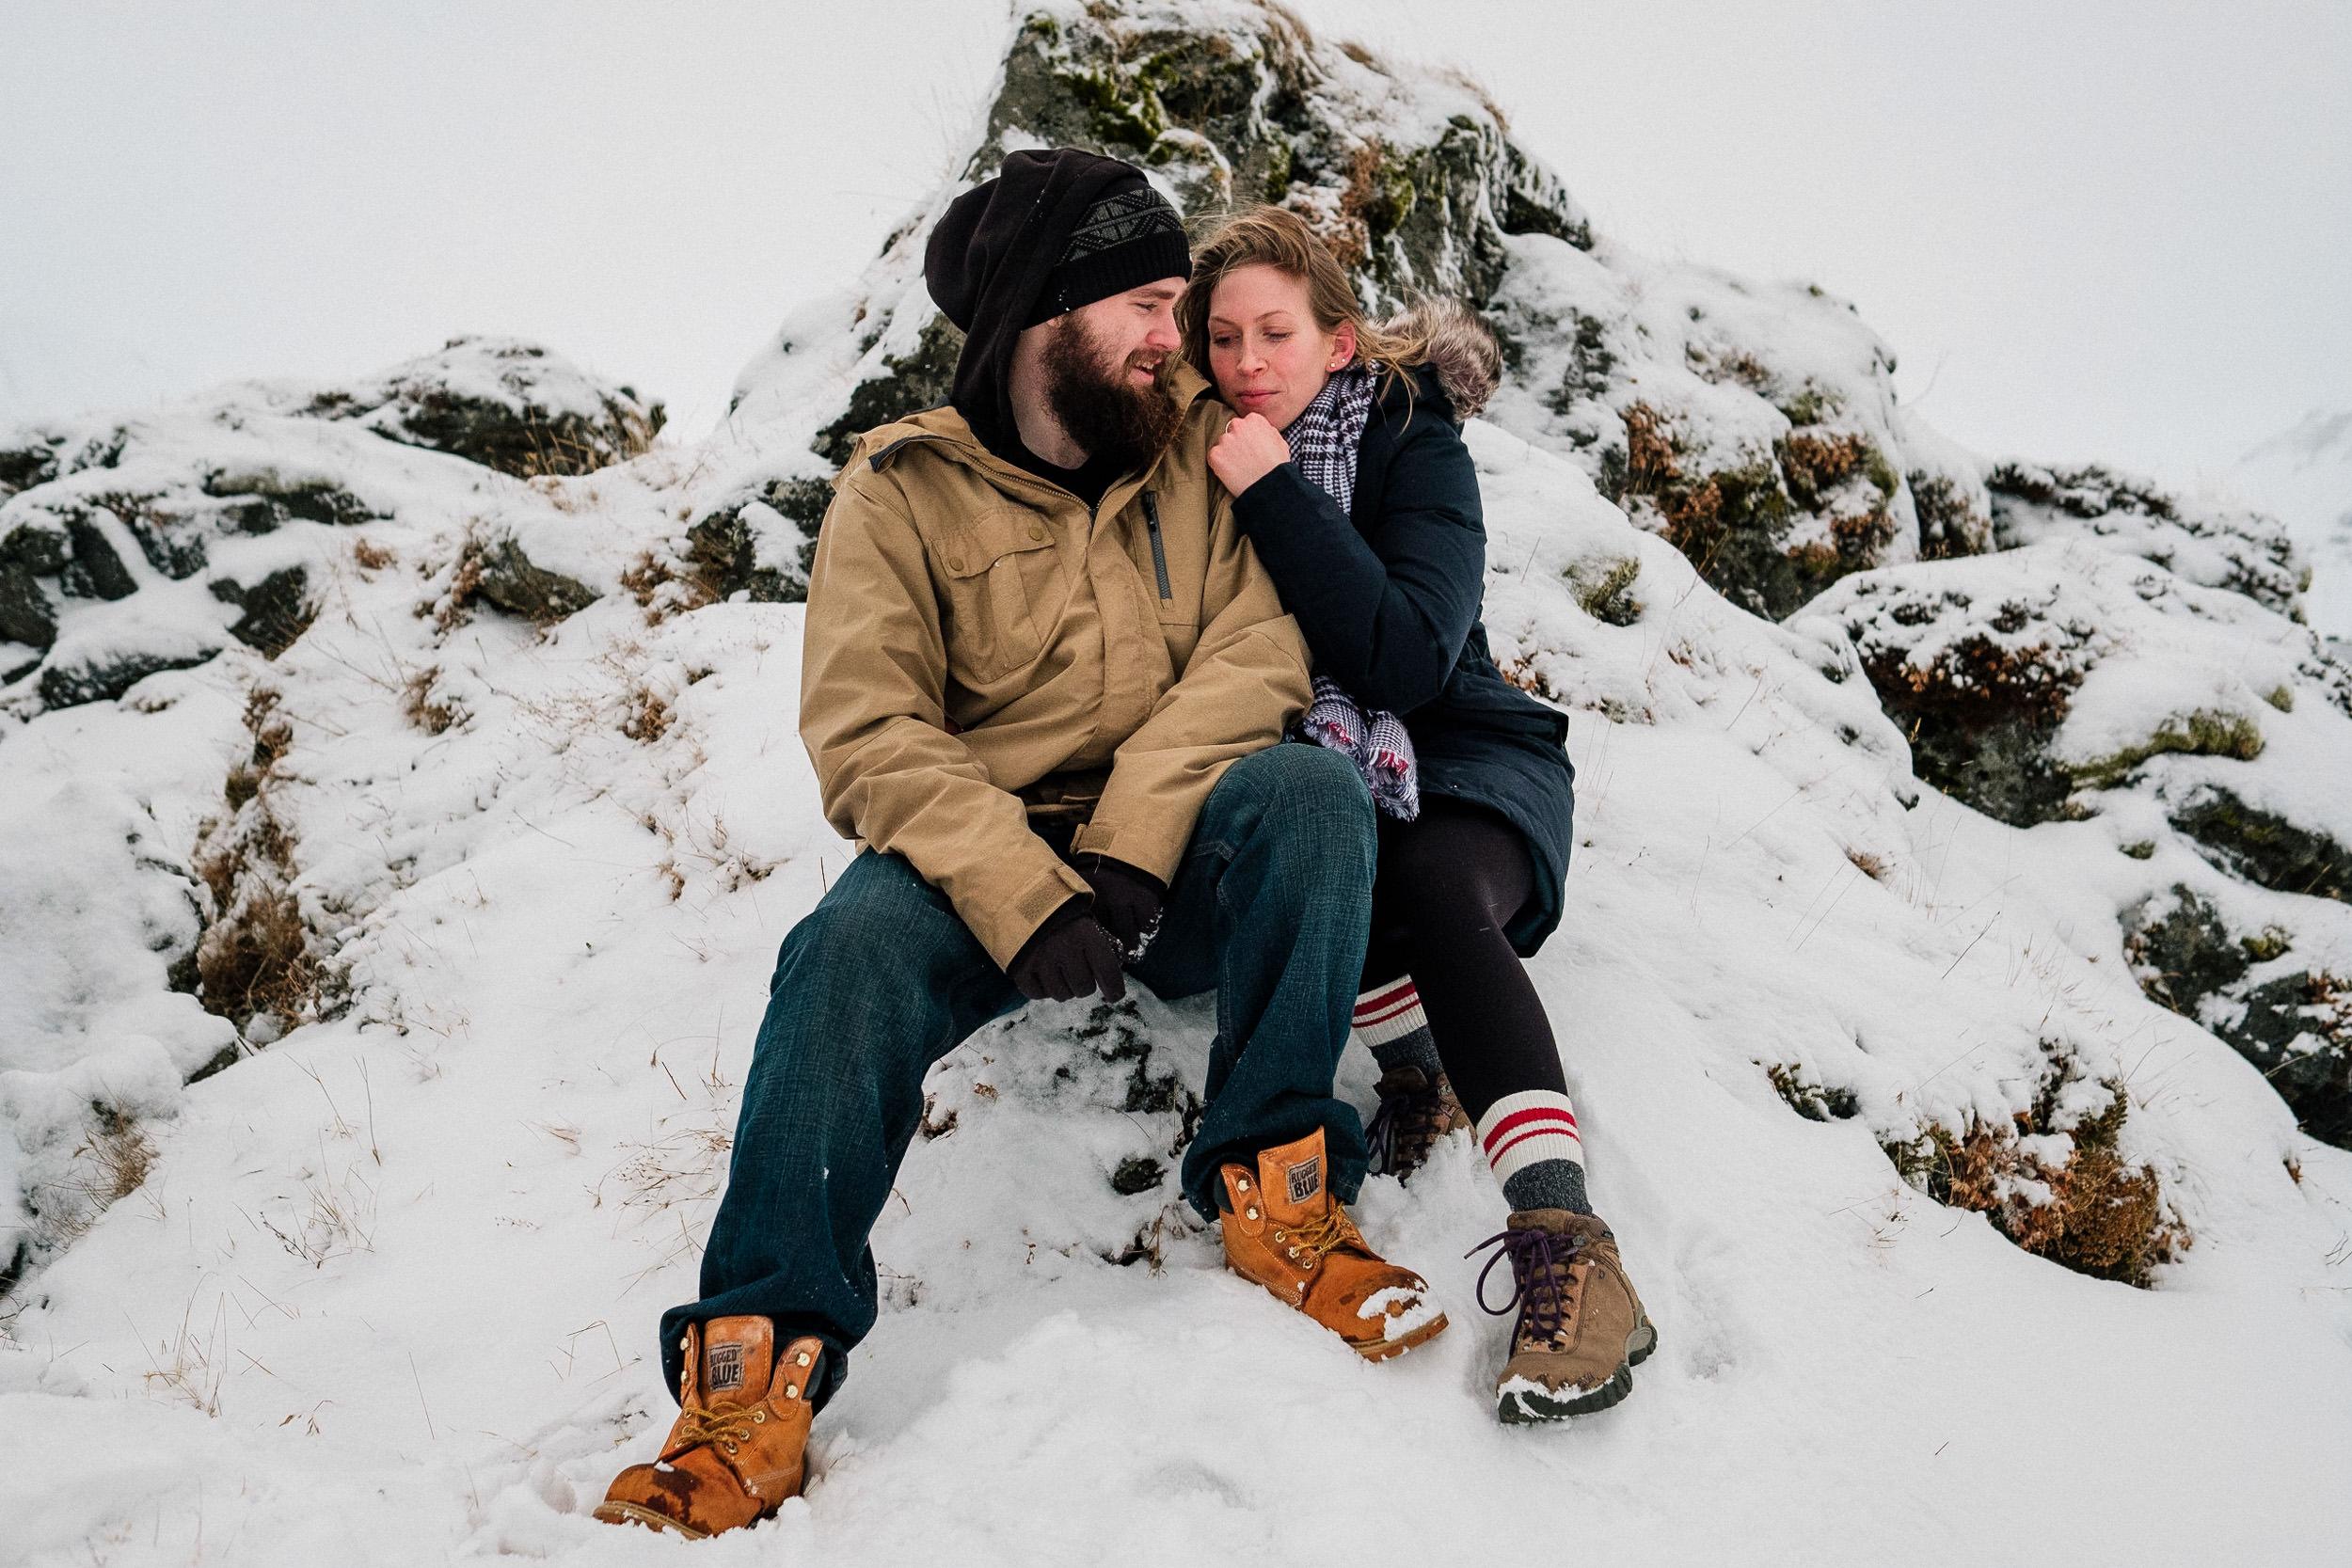 Collective_Wander_Iceland_Photographers_Trip_023.jpg